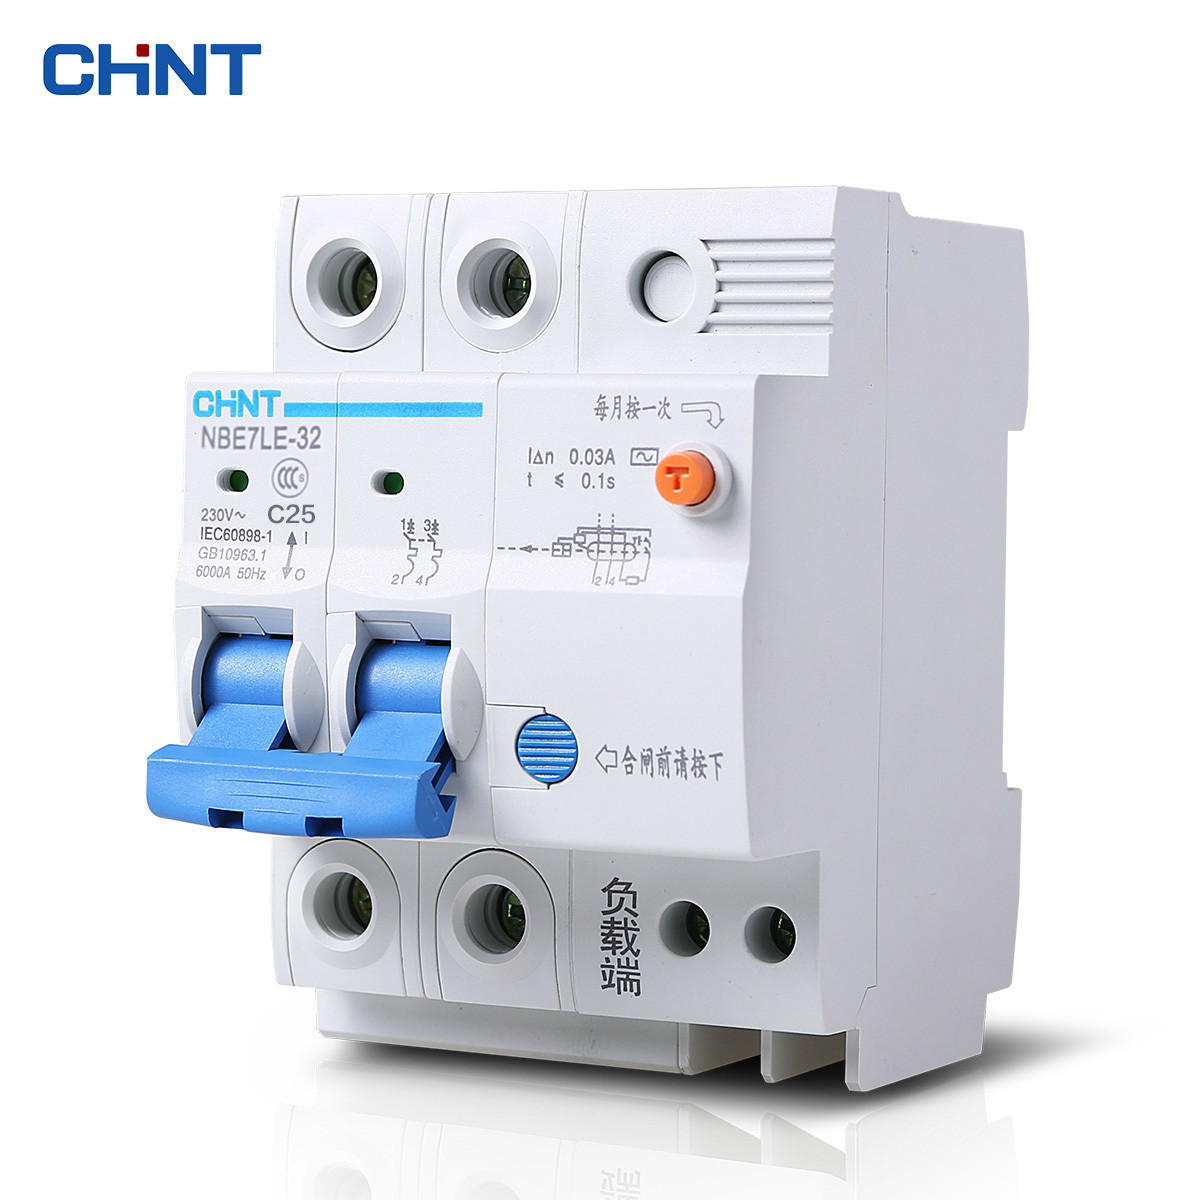 CHINT Interruptor de Aire Disyuntor de Fuga de Protección de Choque Eléctrico NBE7LE C25 2 P 25A Con Interruptor de Circuito de Fuga